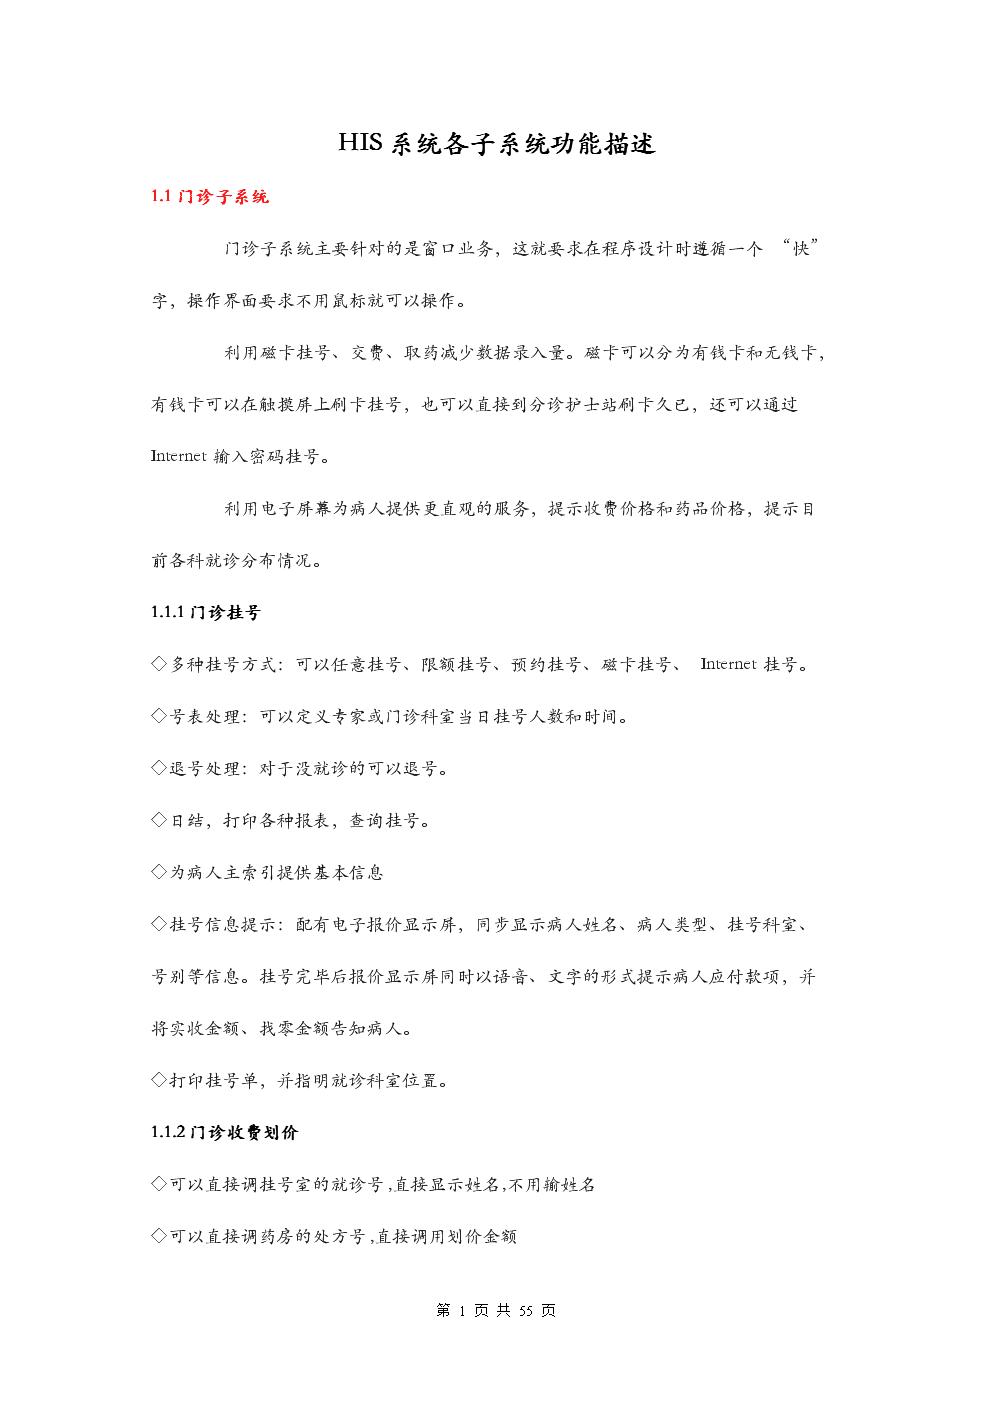 HIS系统各子系统功能及描述.doc